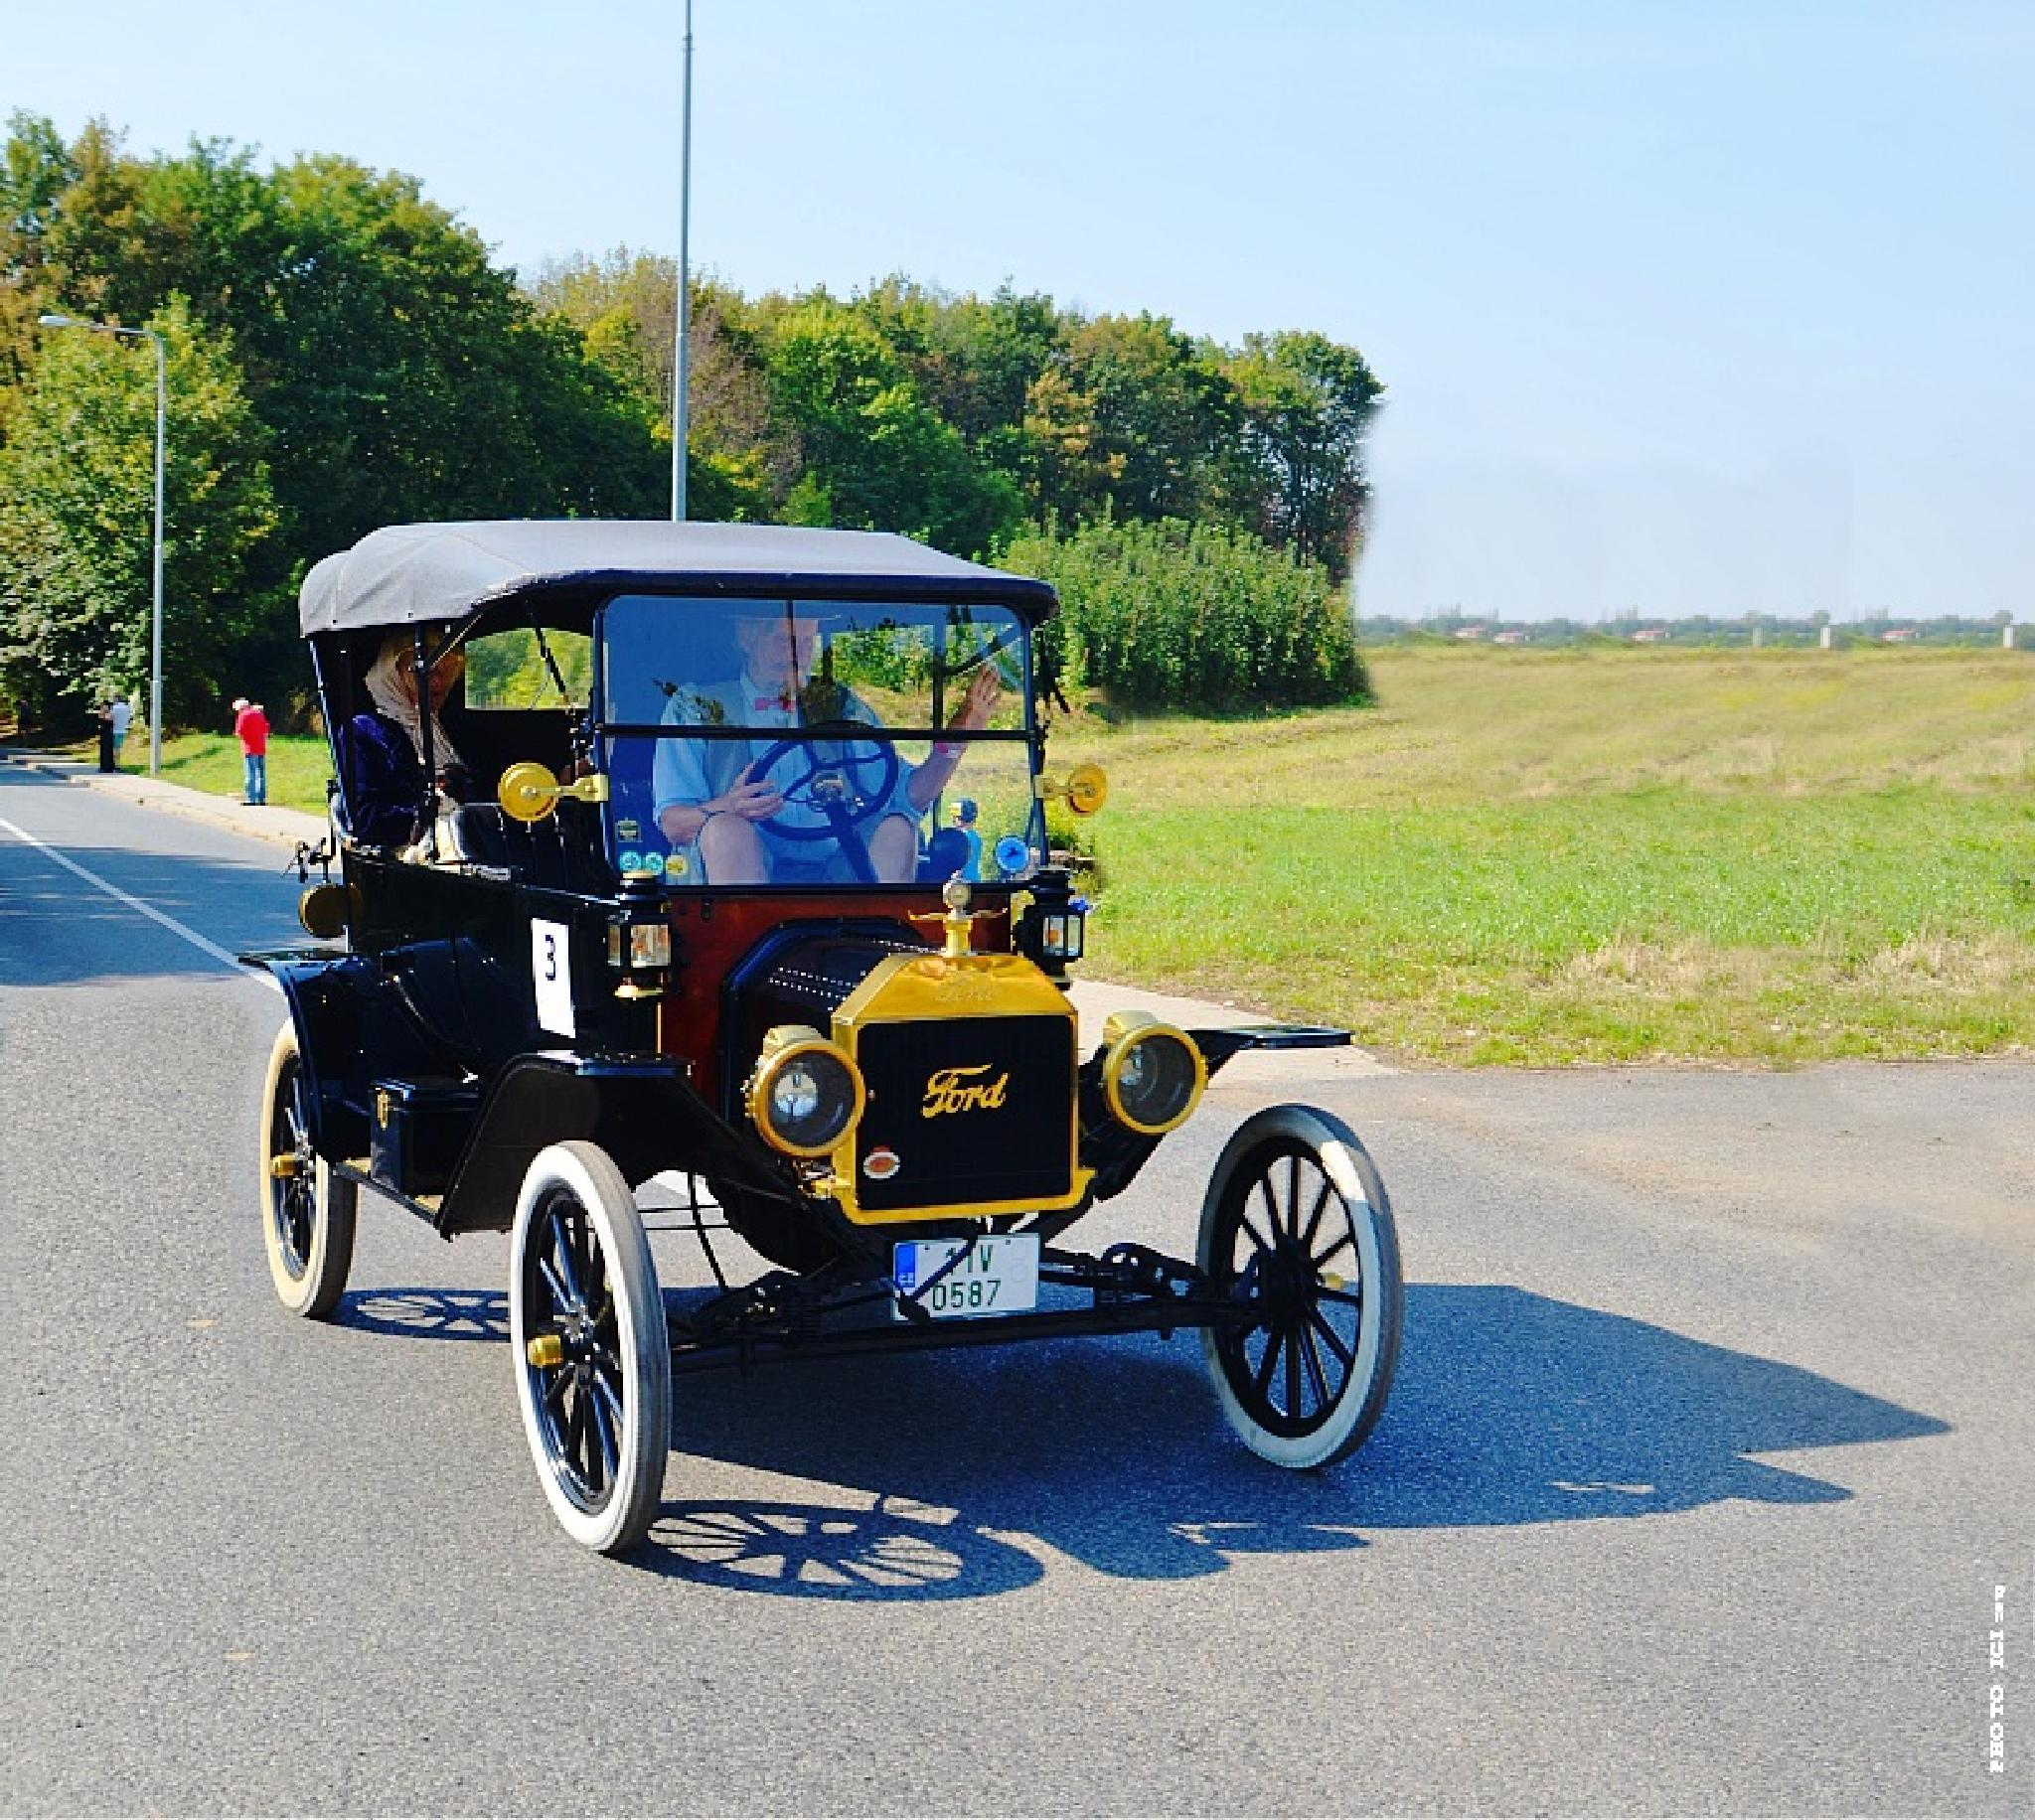 old car  by Igor Bielický